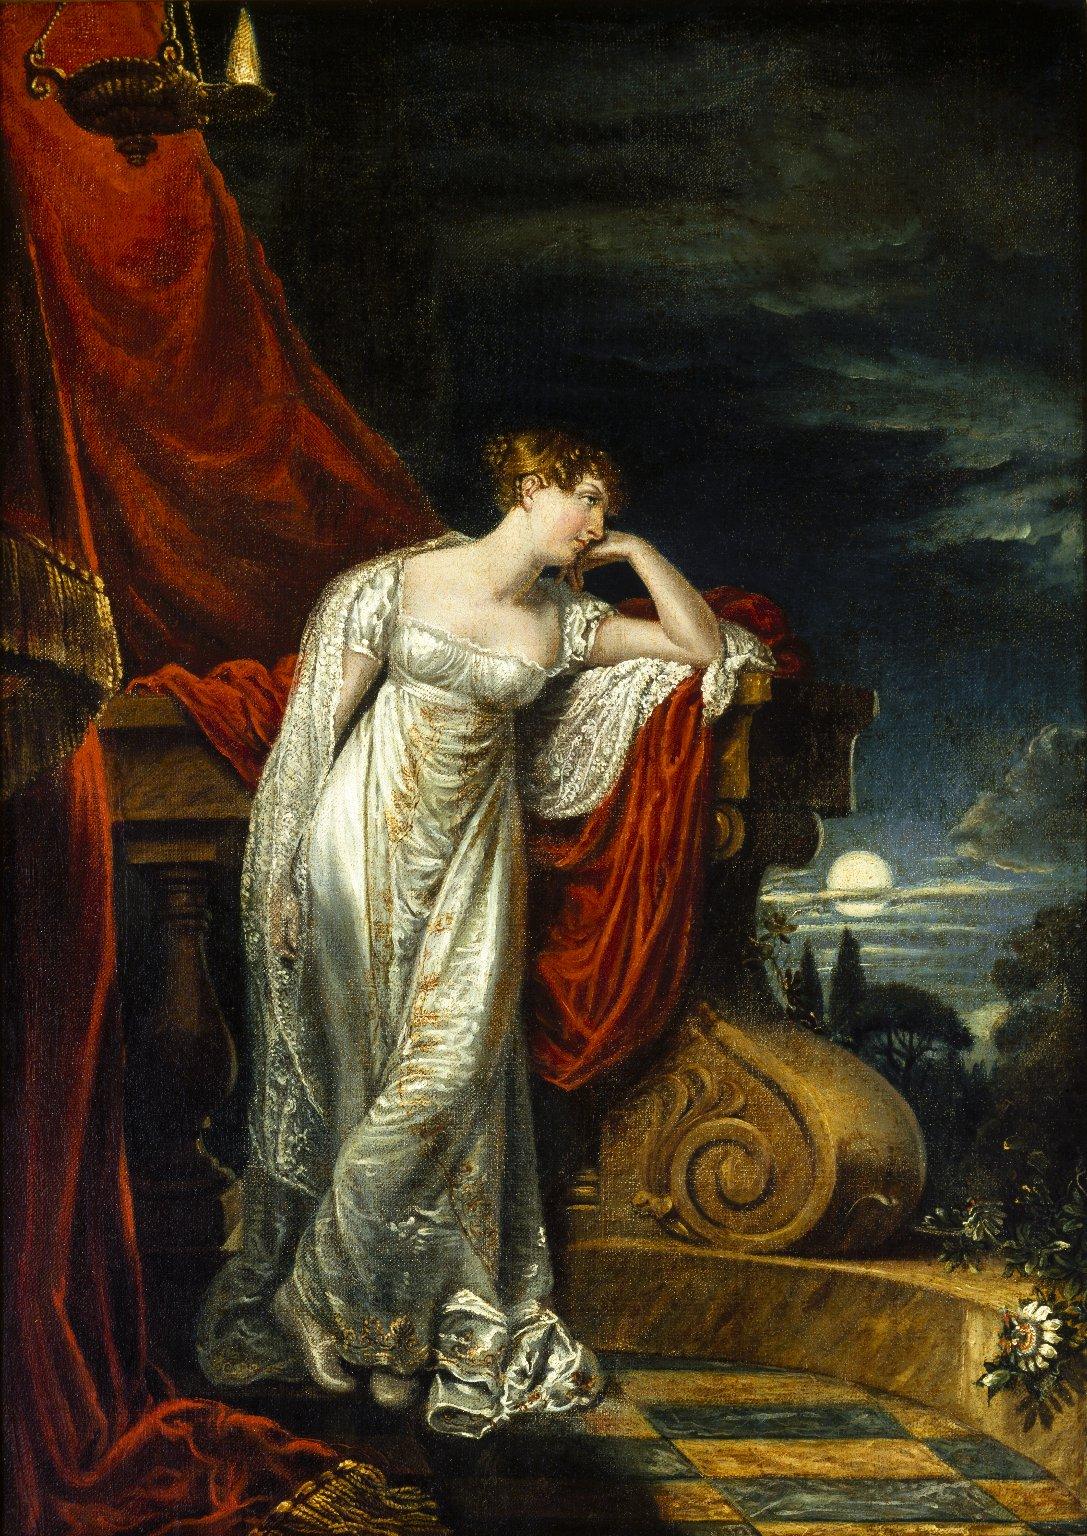 Study for Miss O'Neill as Juliet